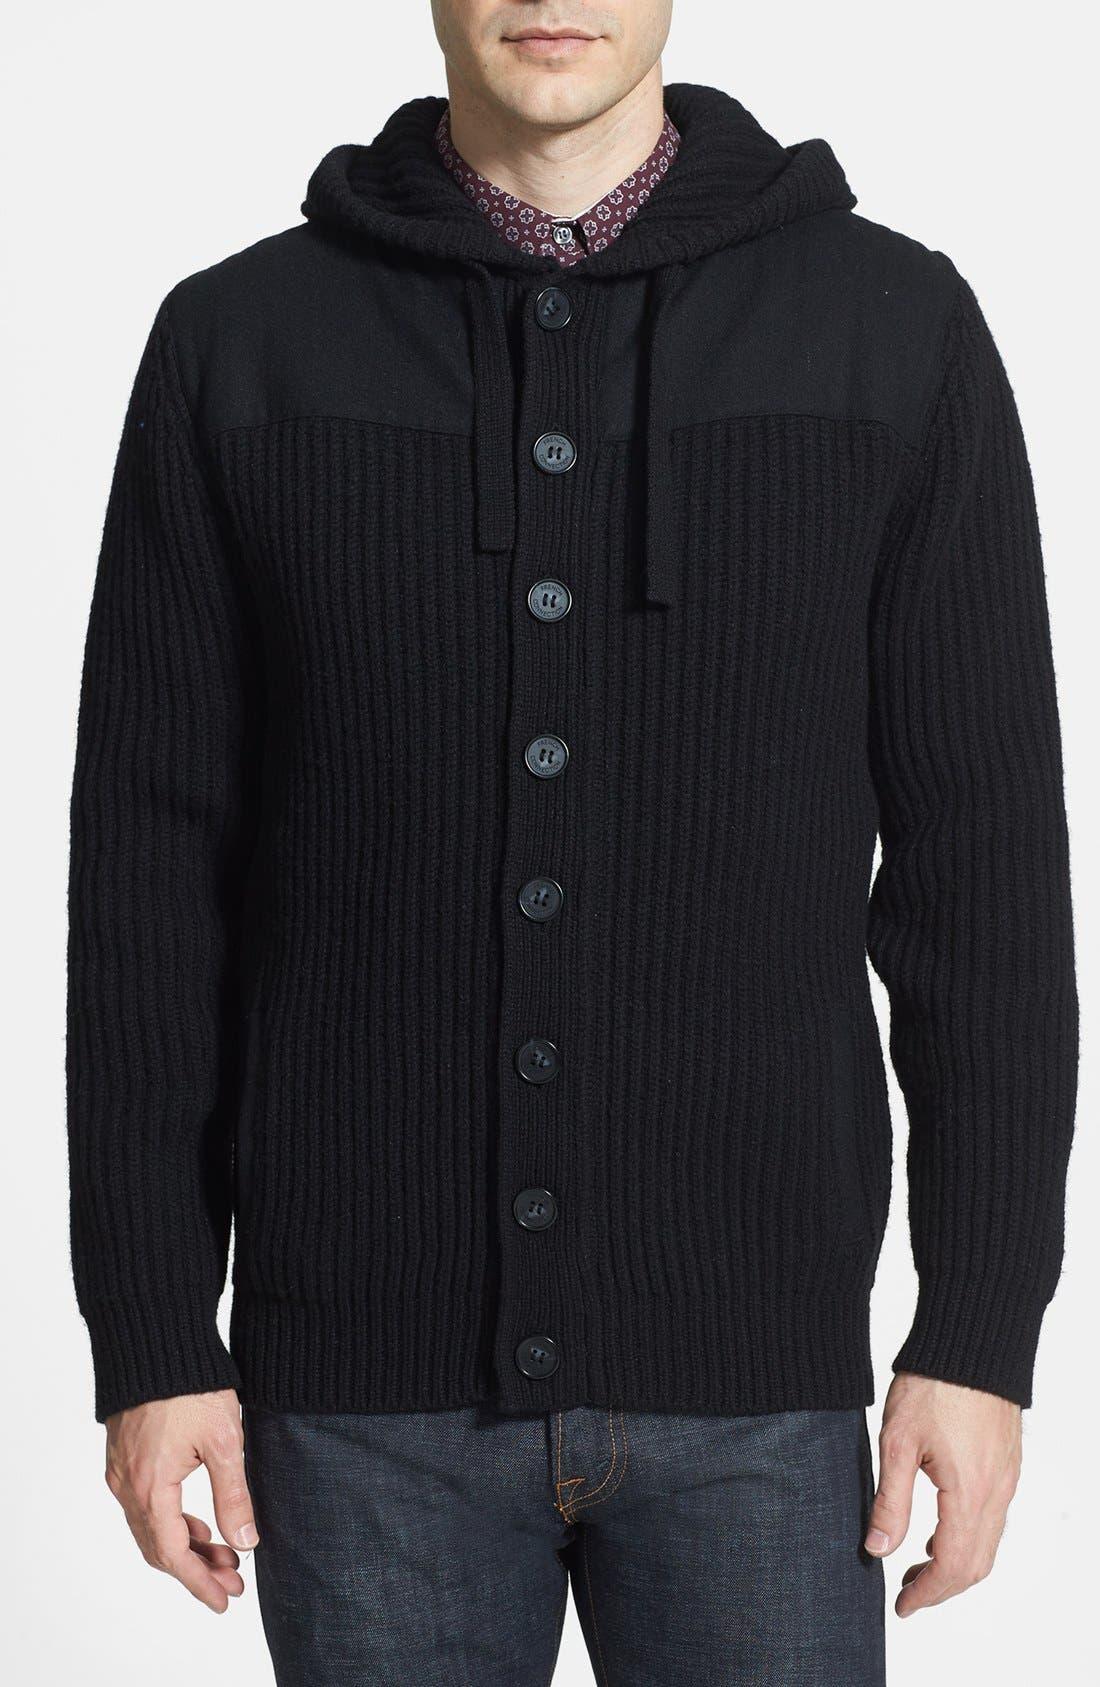 Alternate Image 1 Selected - French Connection 'Myrrh Patch Melton' Sweater Jacket